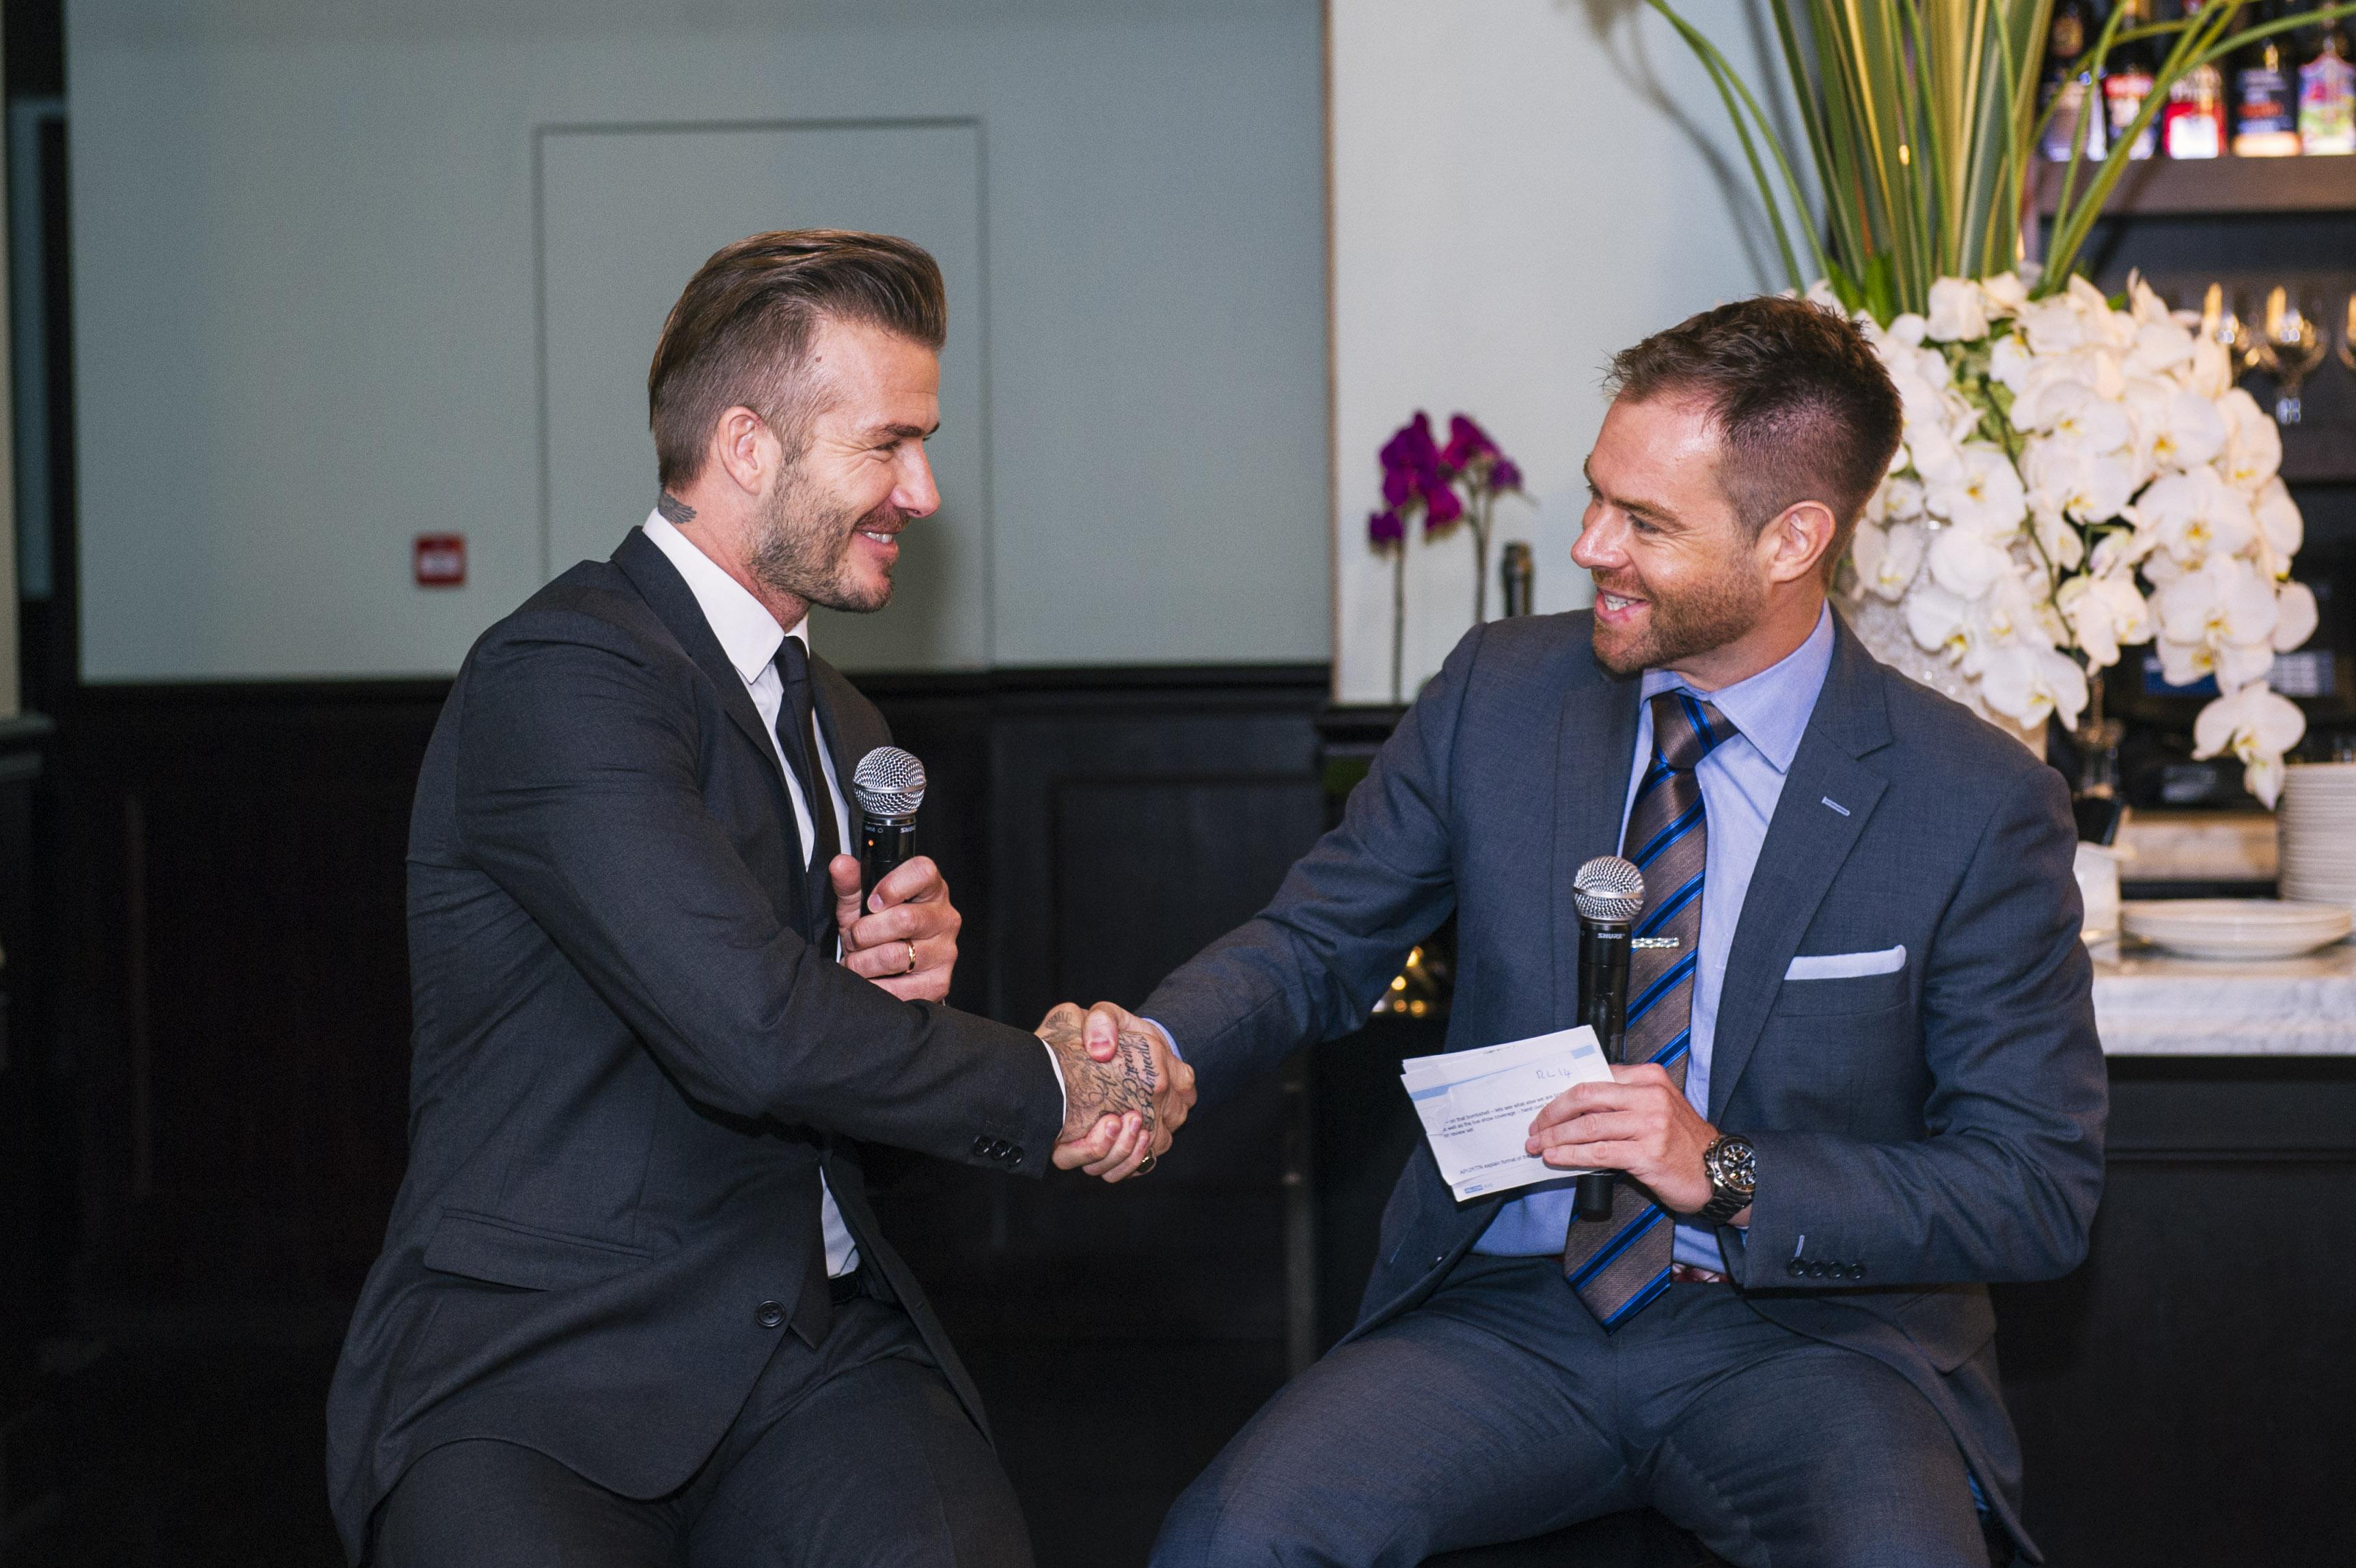 Richard Lenton Hosts Champagne Lunch With David Beckham Artiste